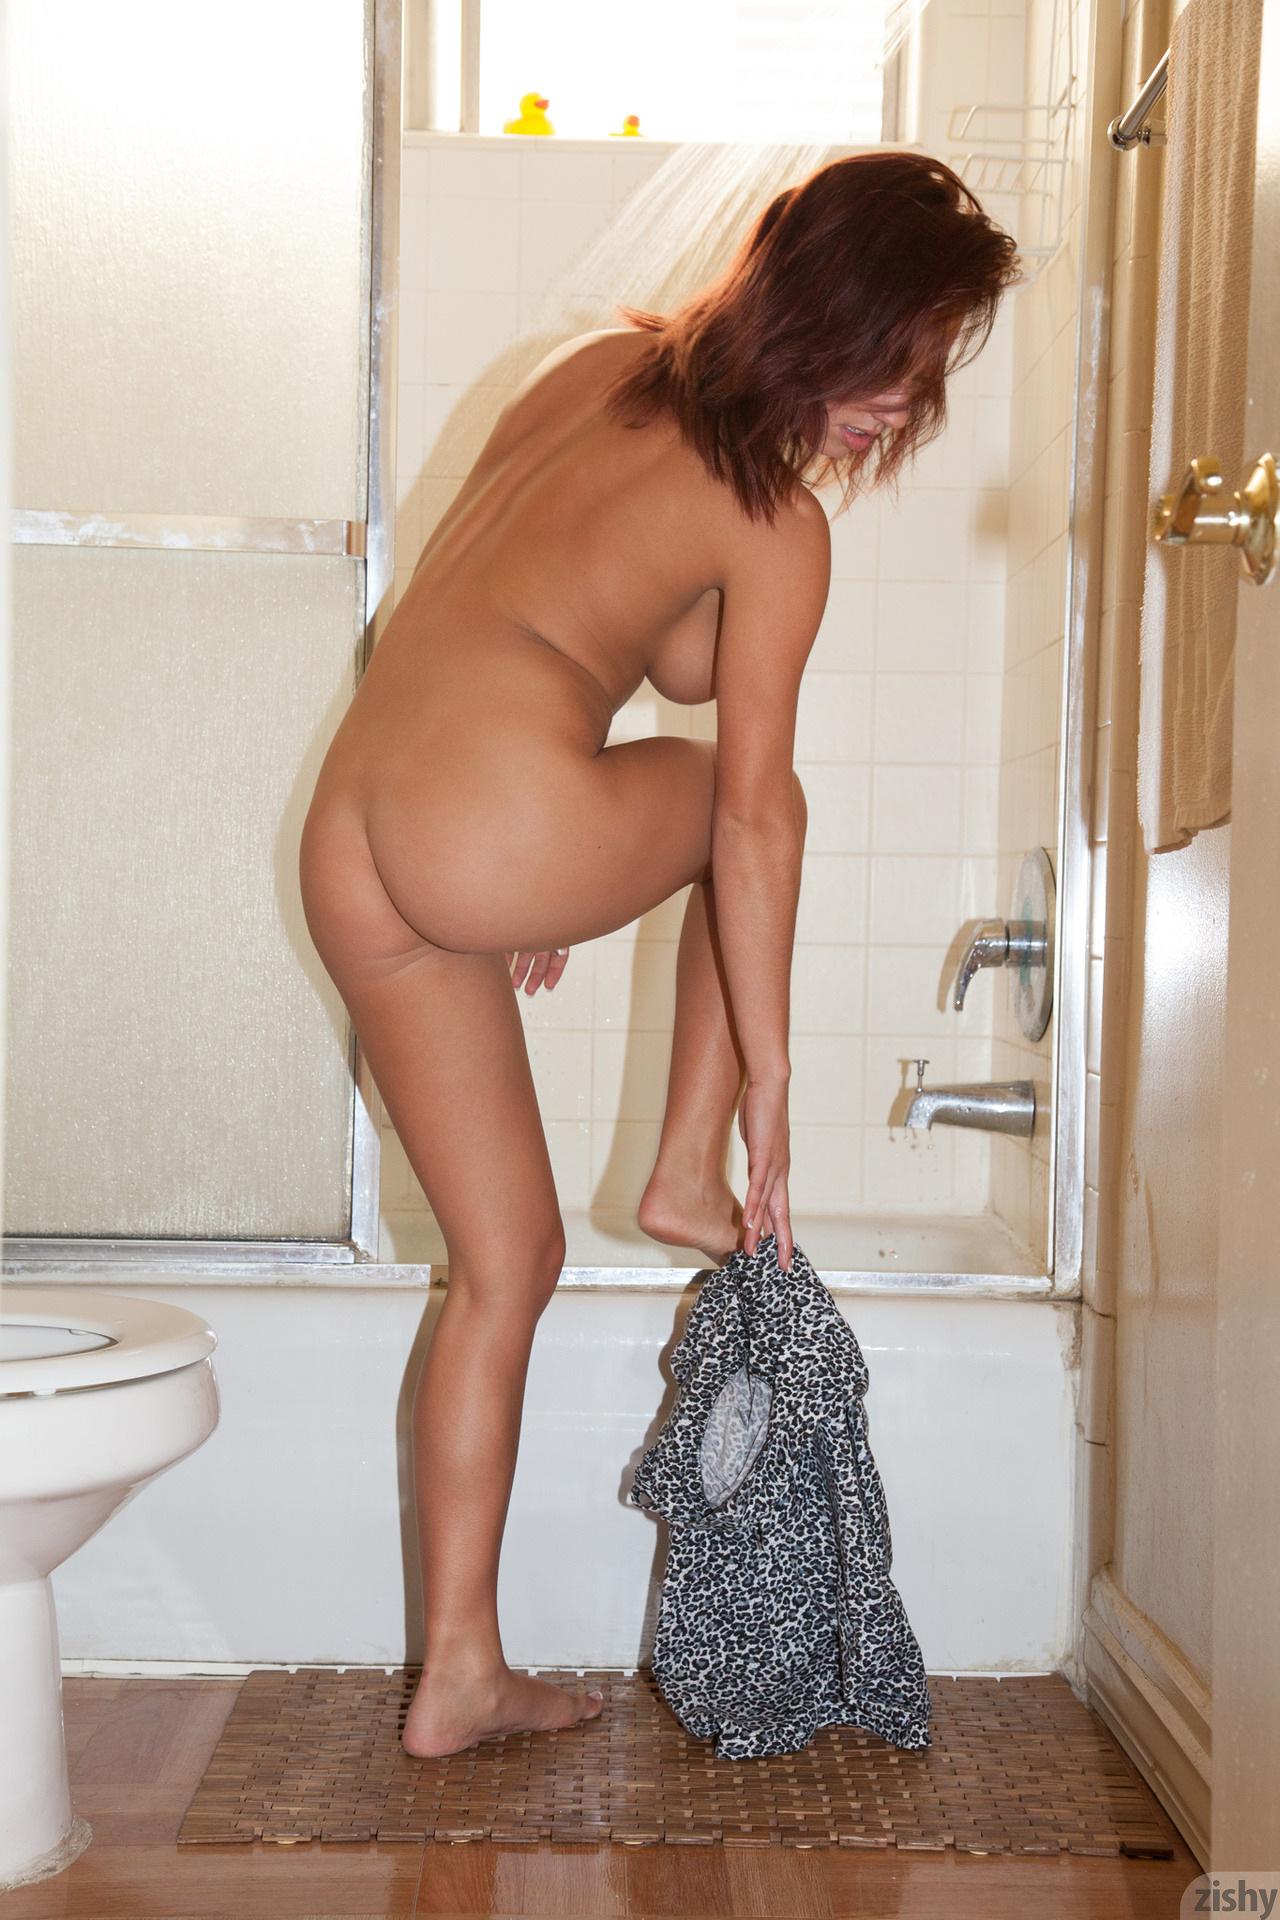 Victoria Lynn Clean The Dirty Zishy (5)